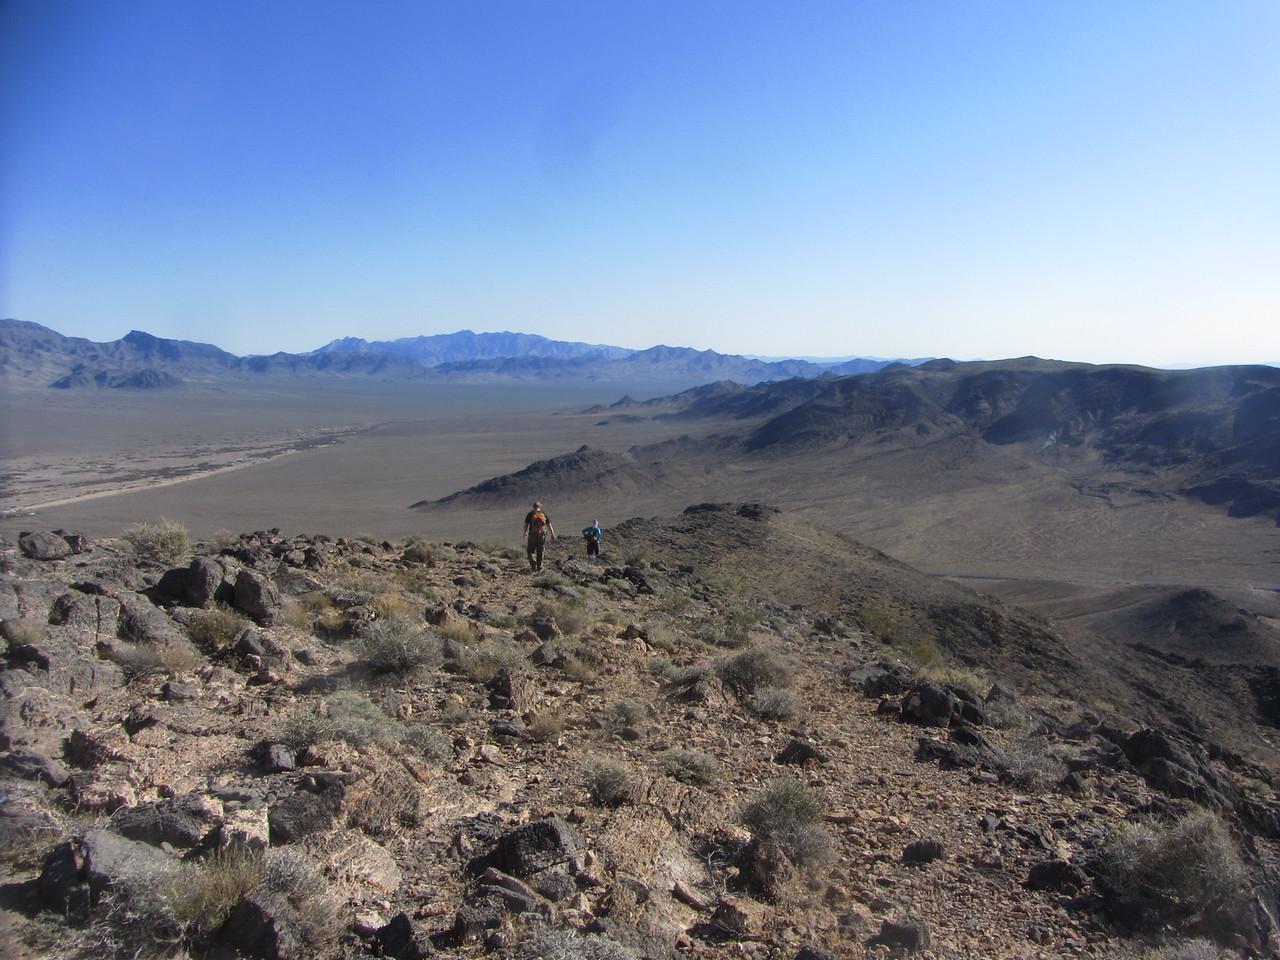 Heading back down the open ridge